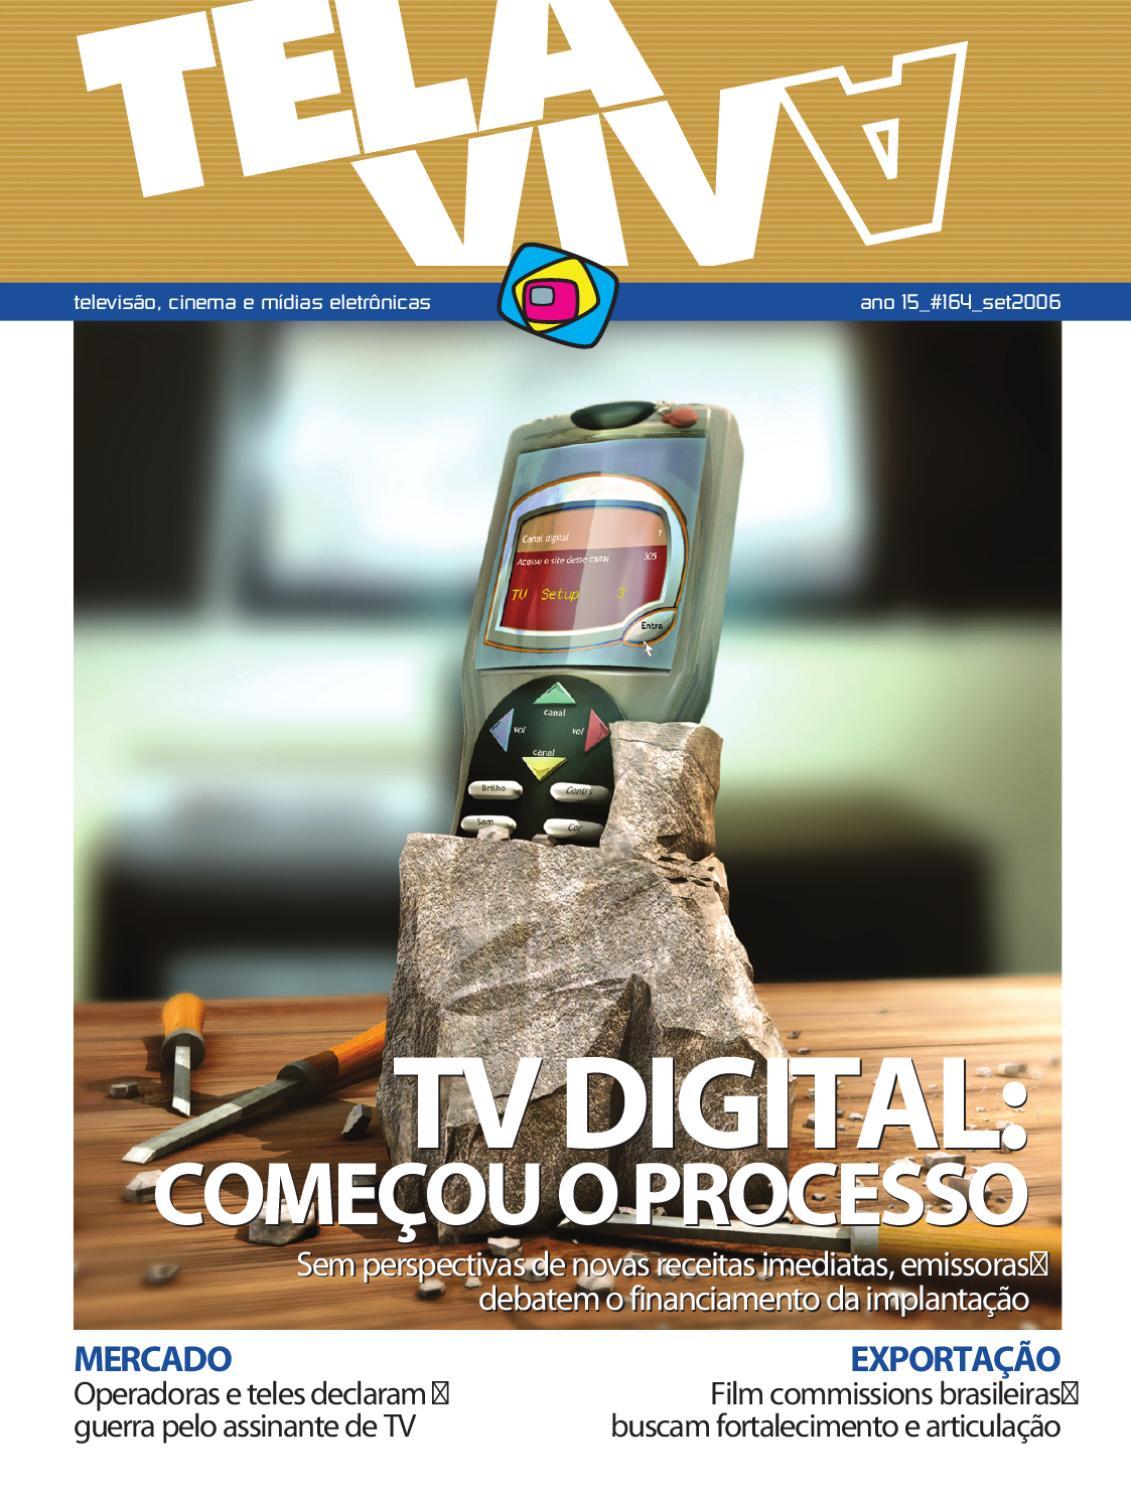 e6b26bec4c2 Revista Tela Viva 164 - setembro 2006 by Converge Comunicacoes - issuu